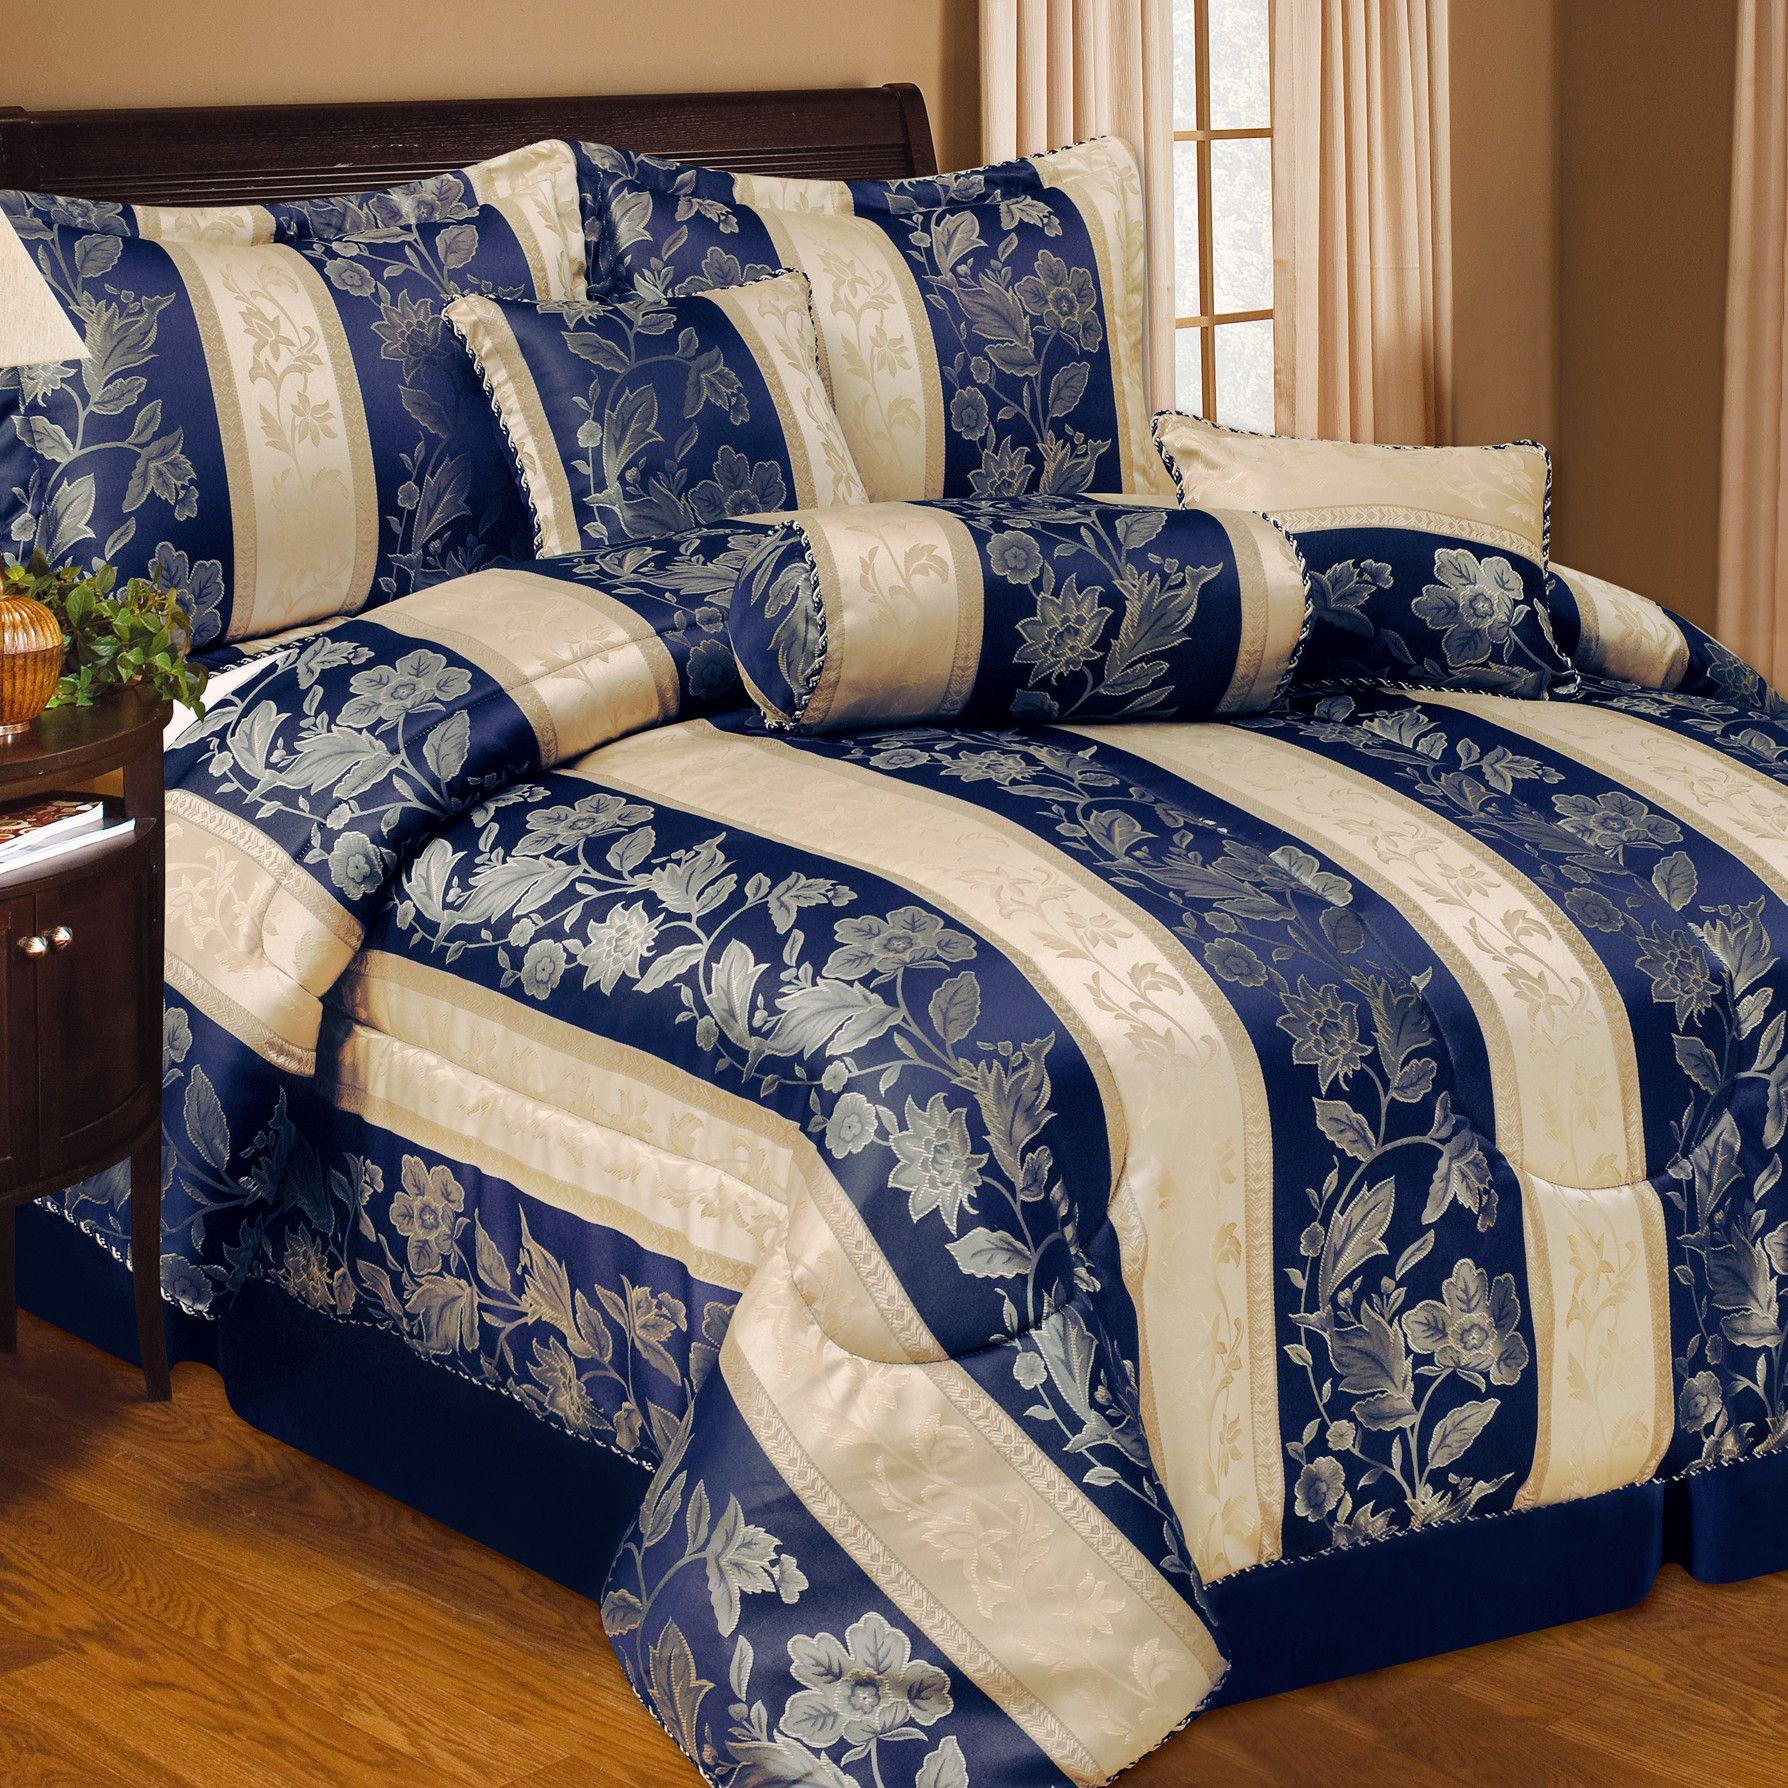 Soho Hotel 7 Piece Comforter Set Products Comforters